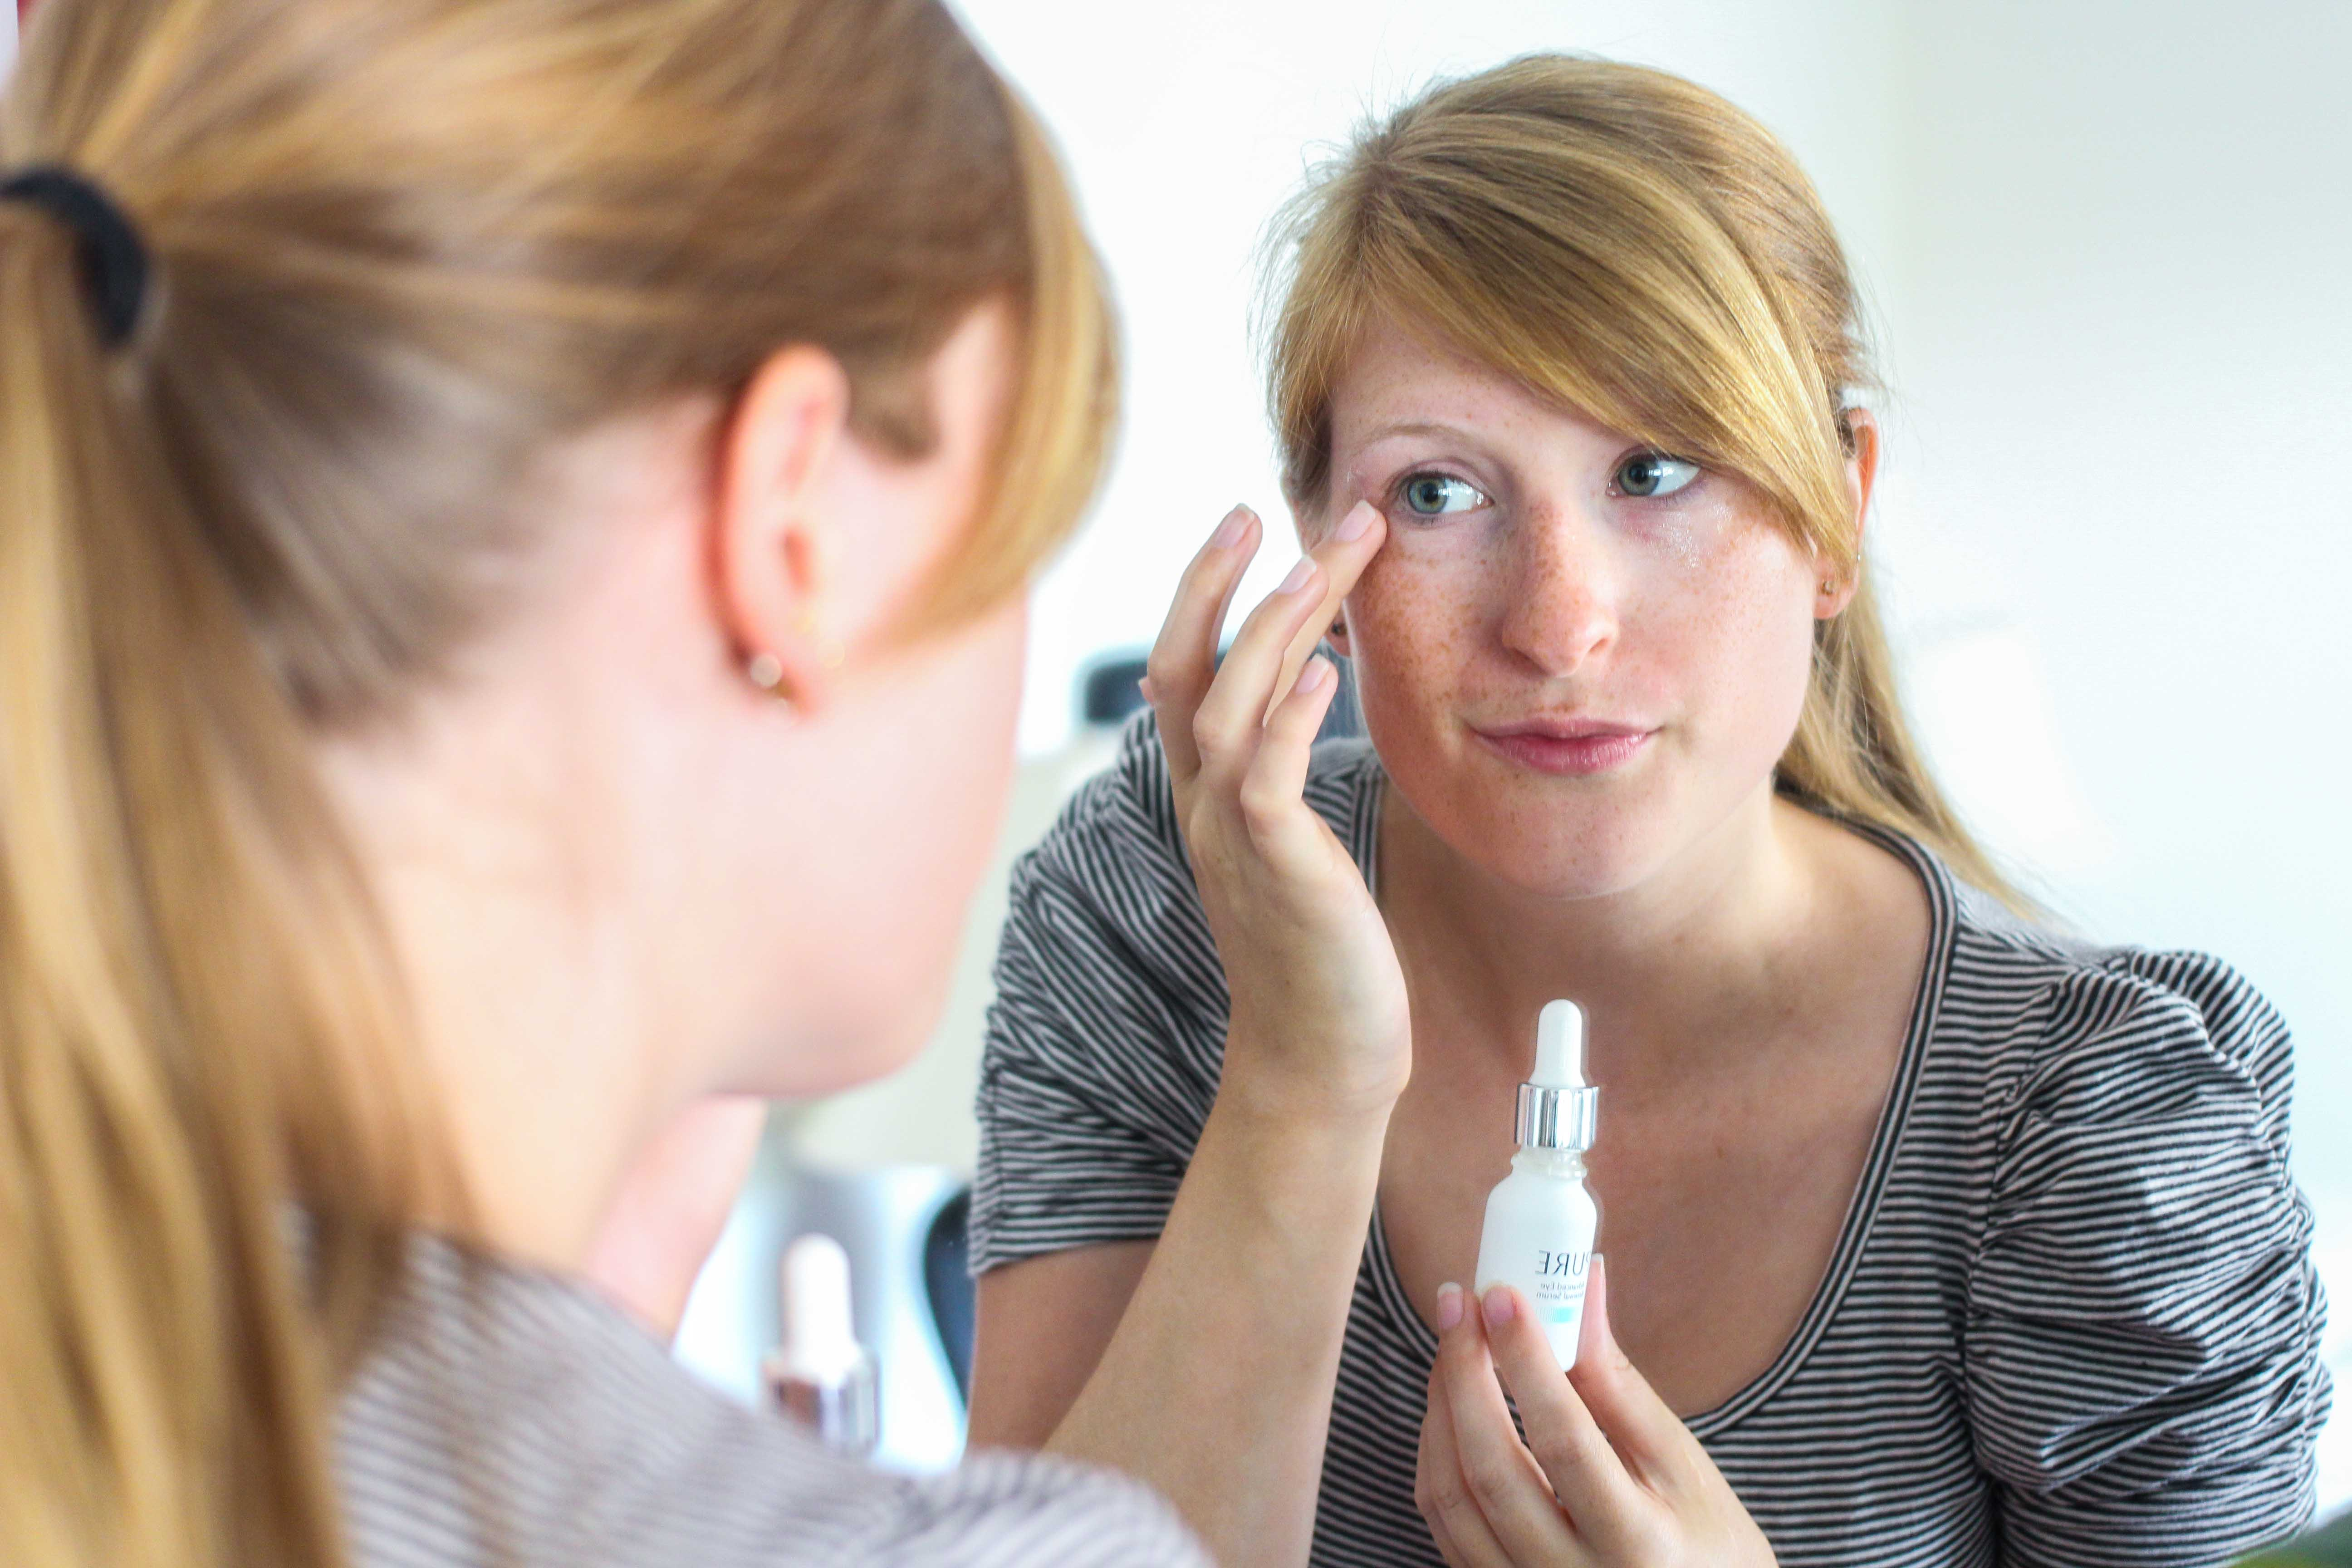 Beauty Augenpartie frische Haut PURE Serum gegen Falten Augenringe Orphica Beauty Blog Anwendung